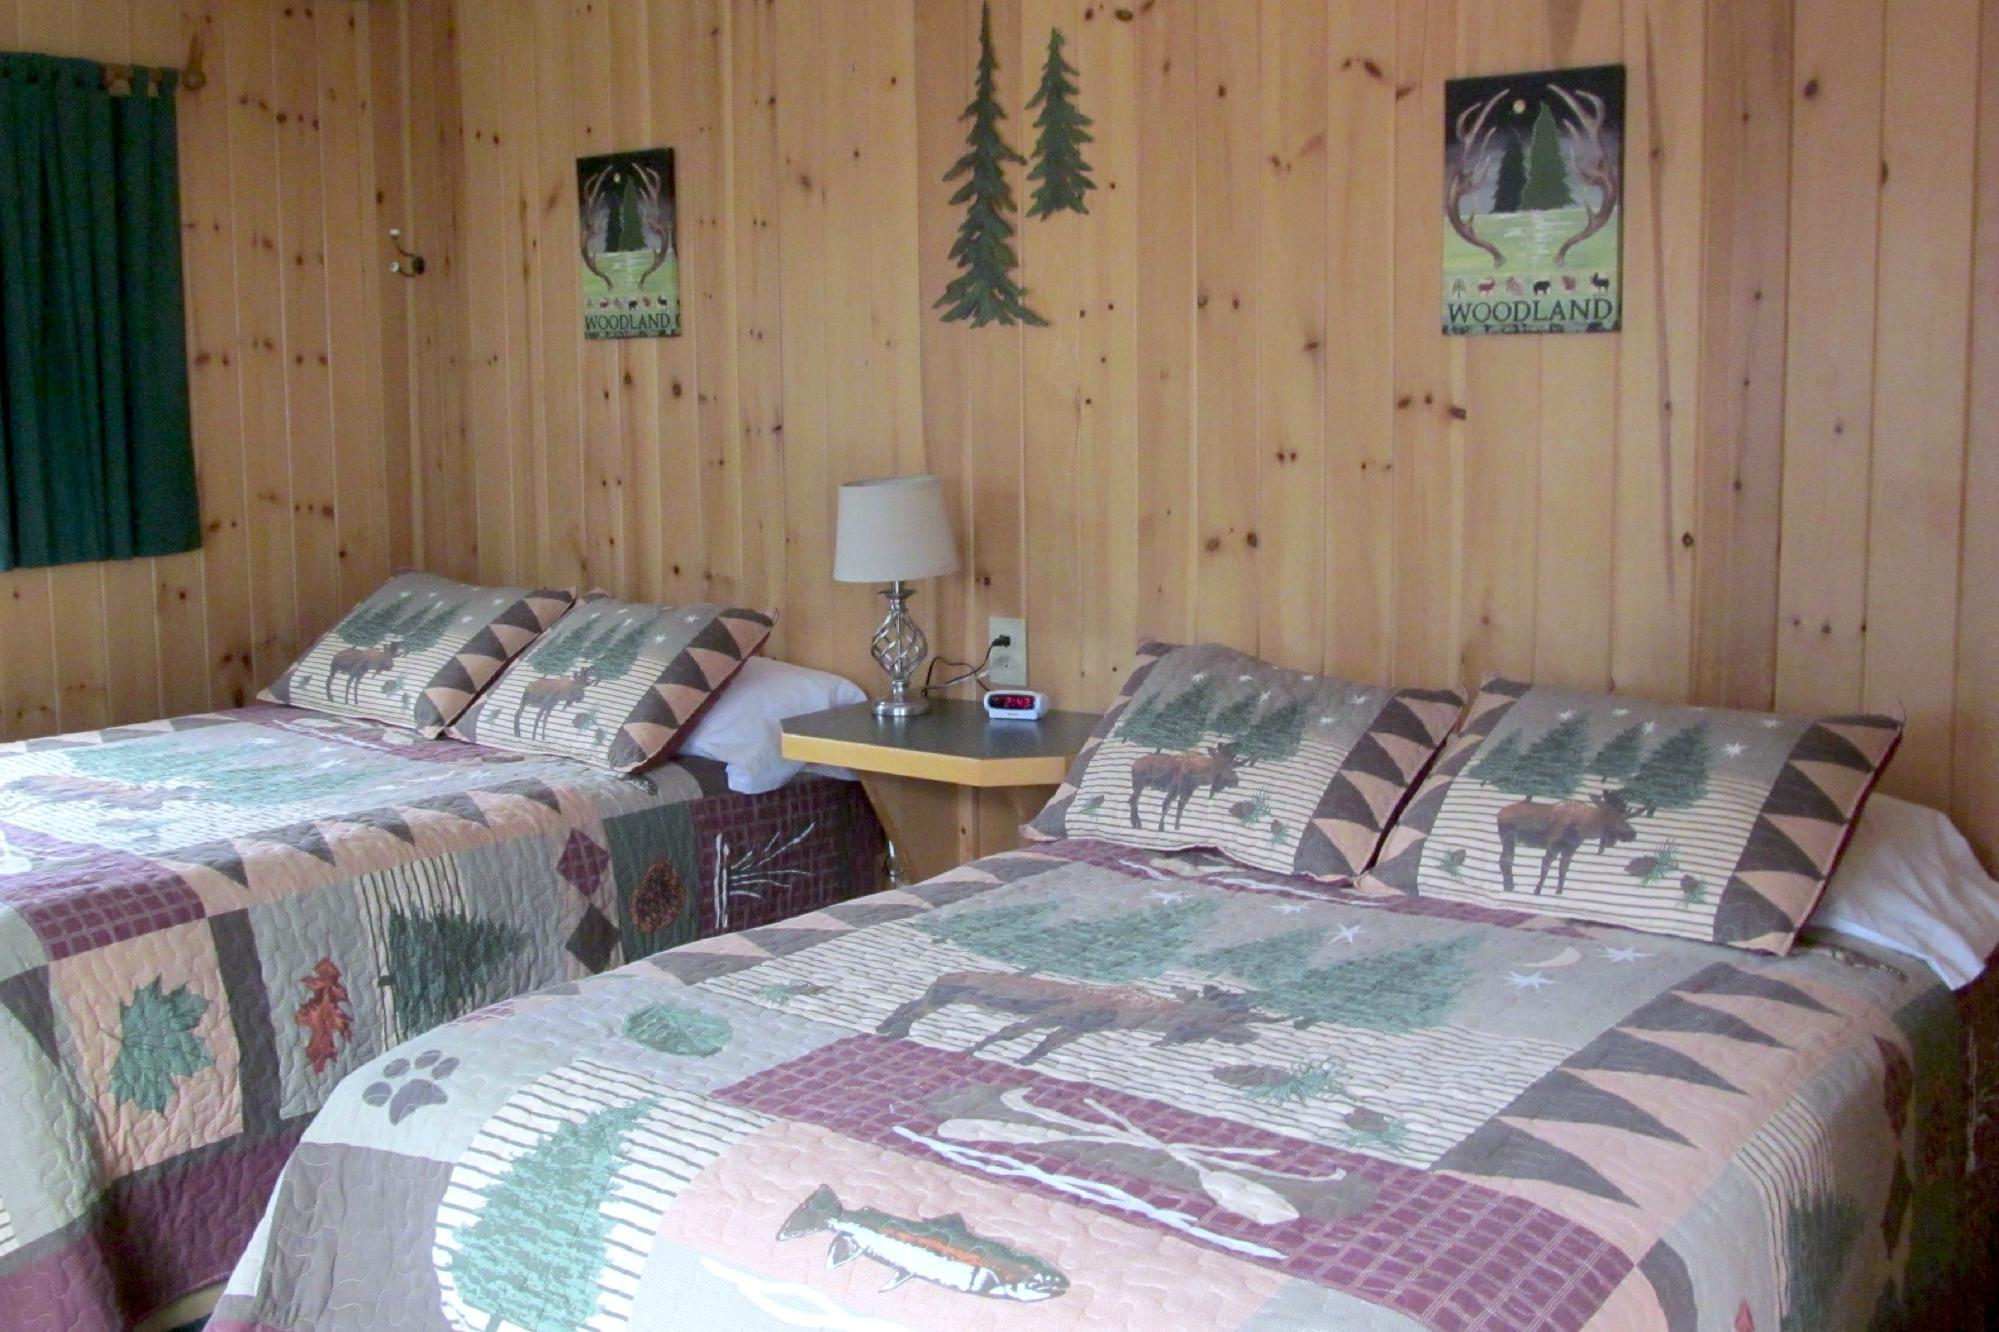 Mangy Moose Motel